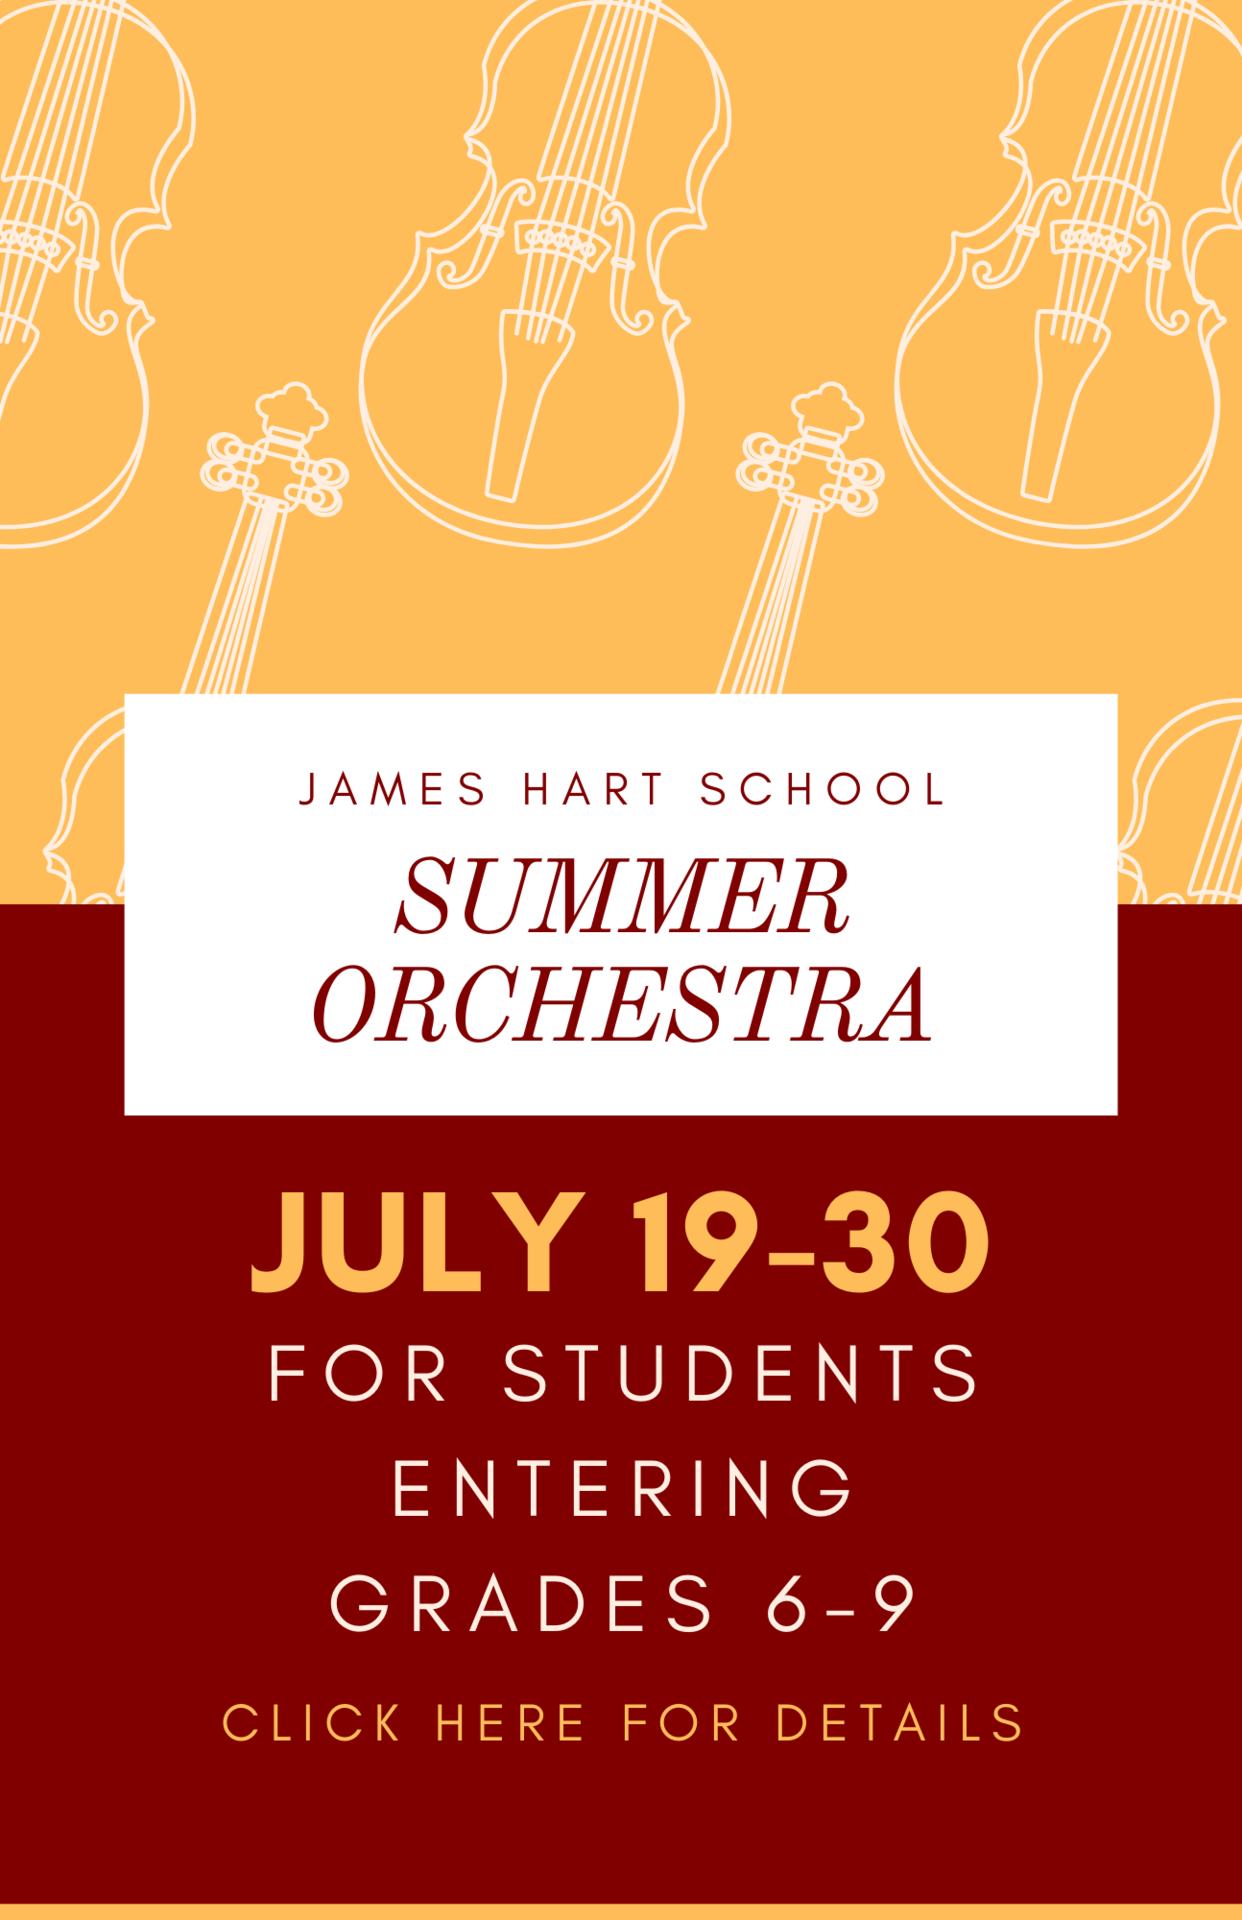 James Hart summer orchestra